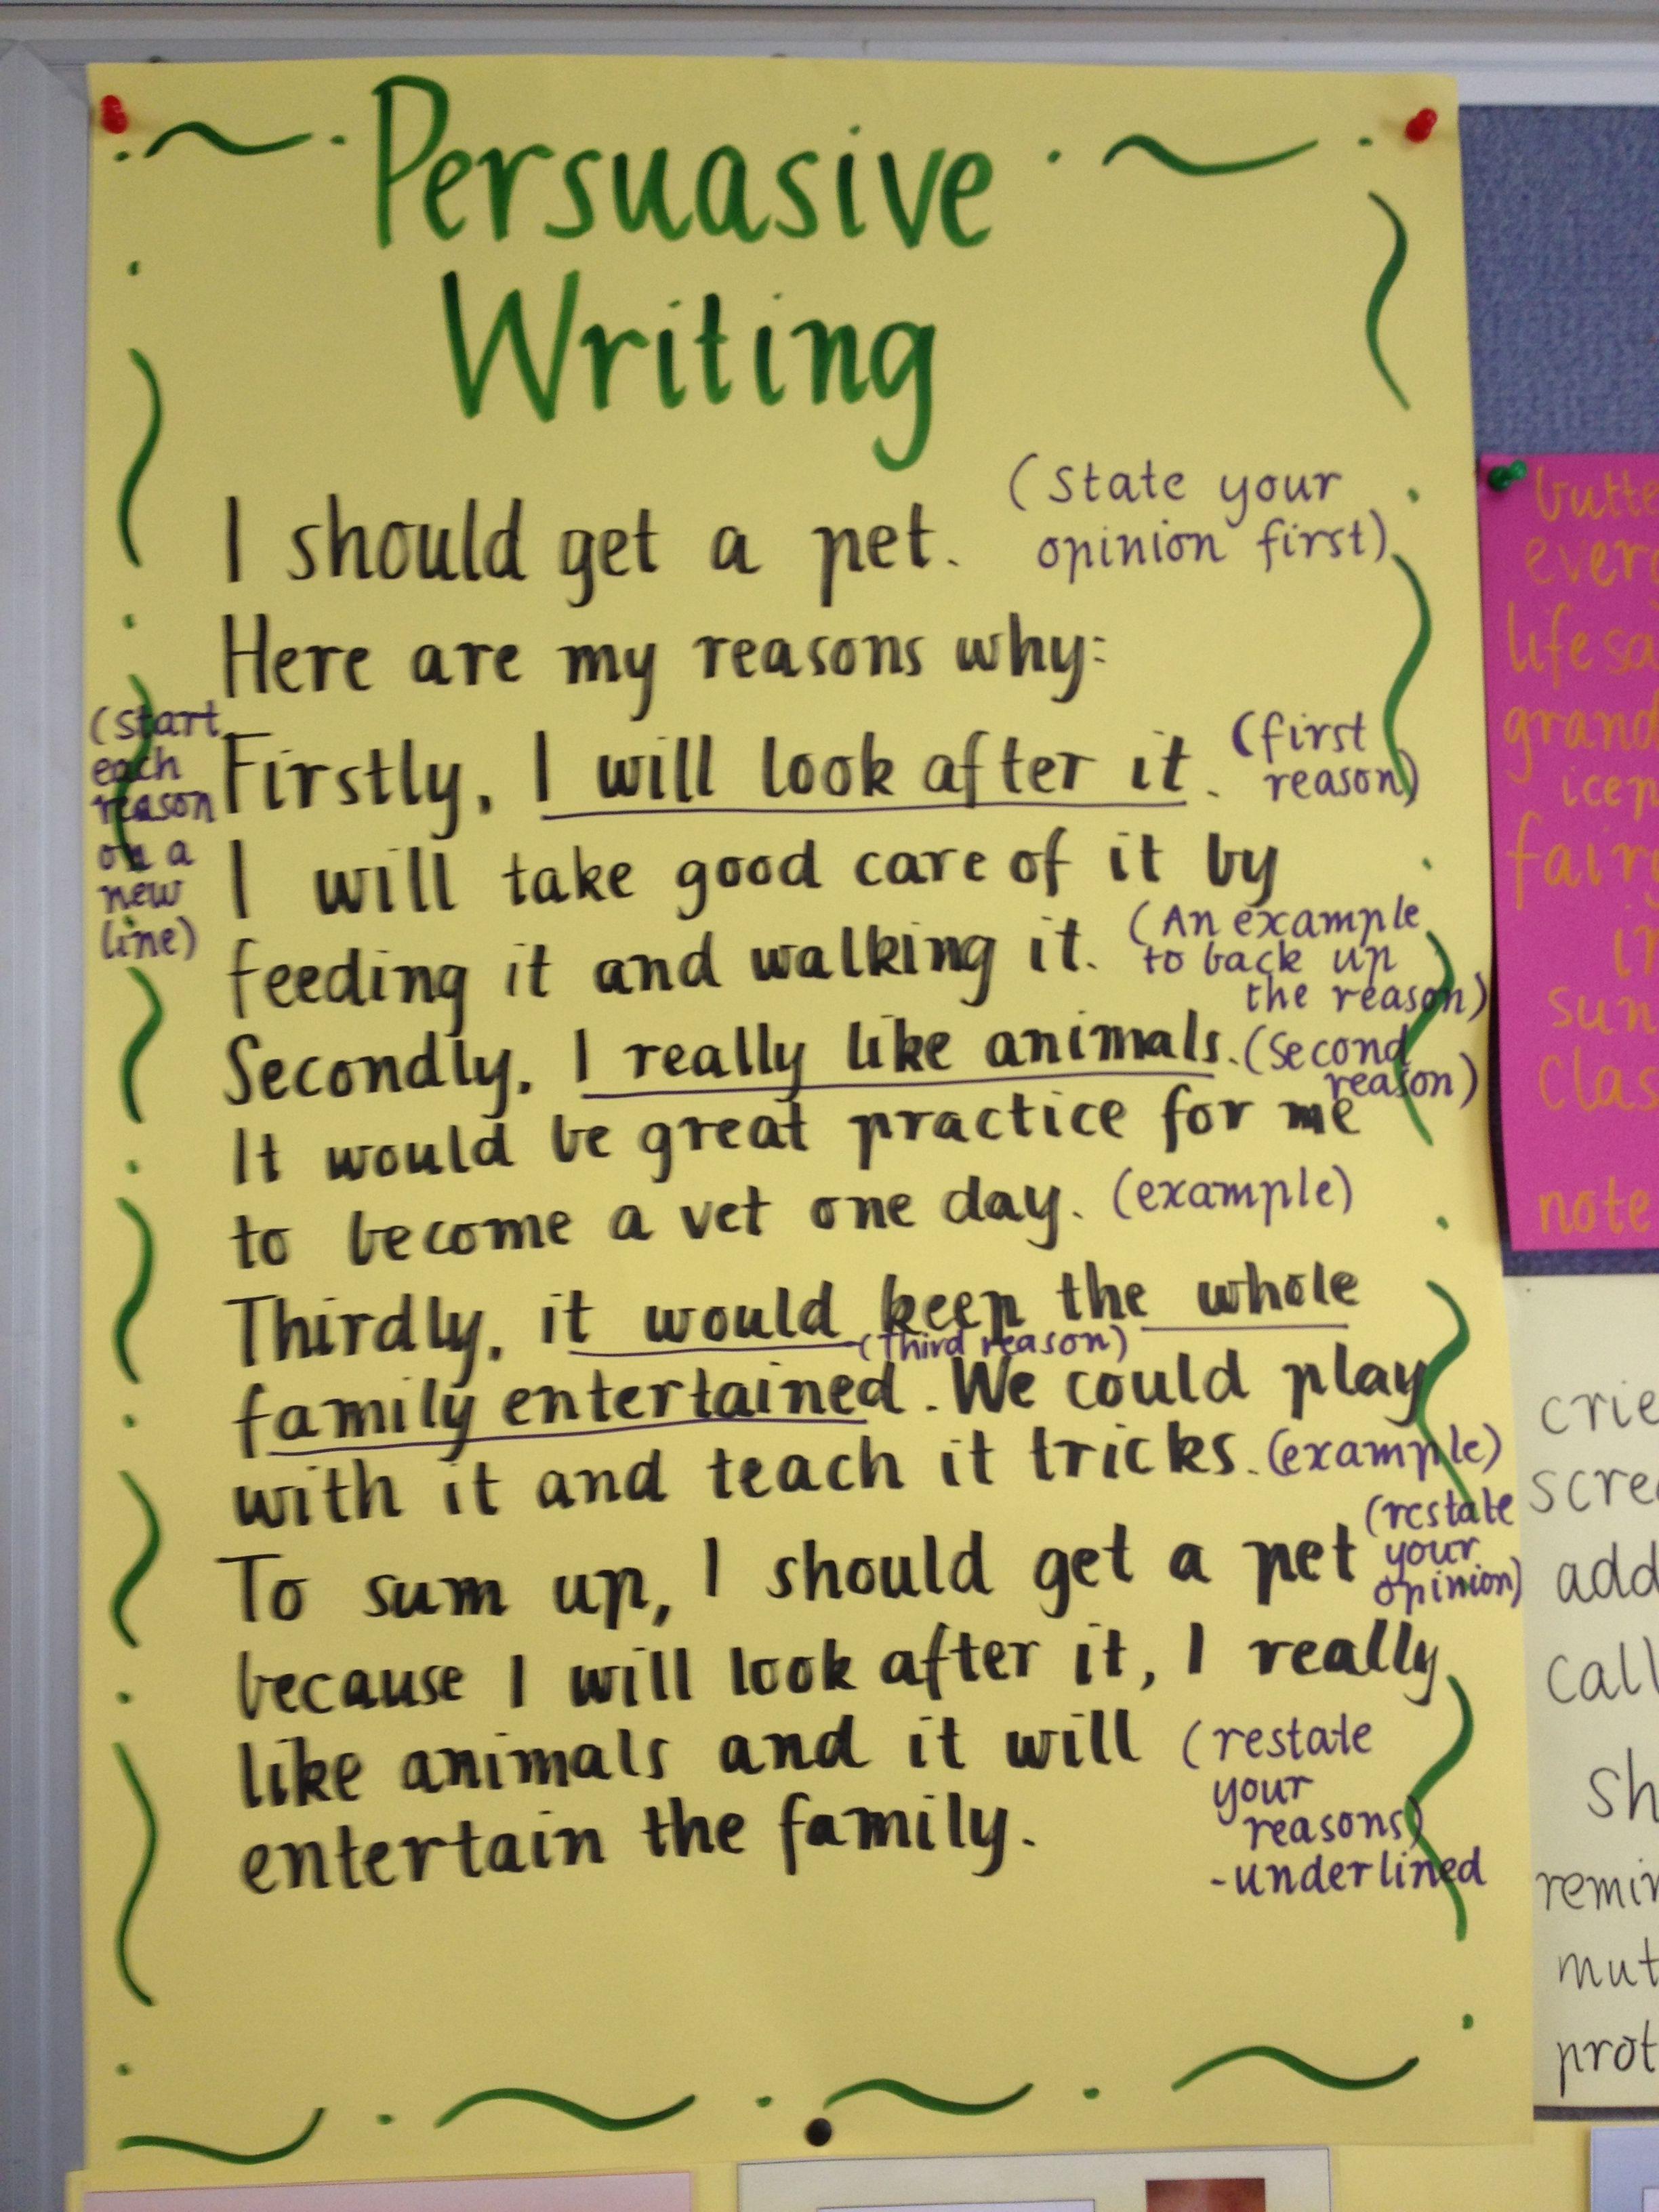 000 Persuasive writing poster. Persuasive writing, Writing